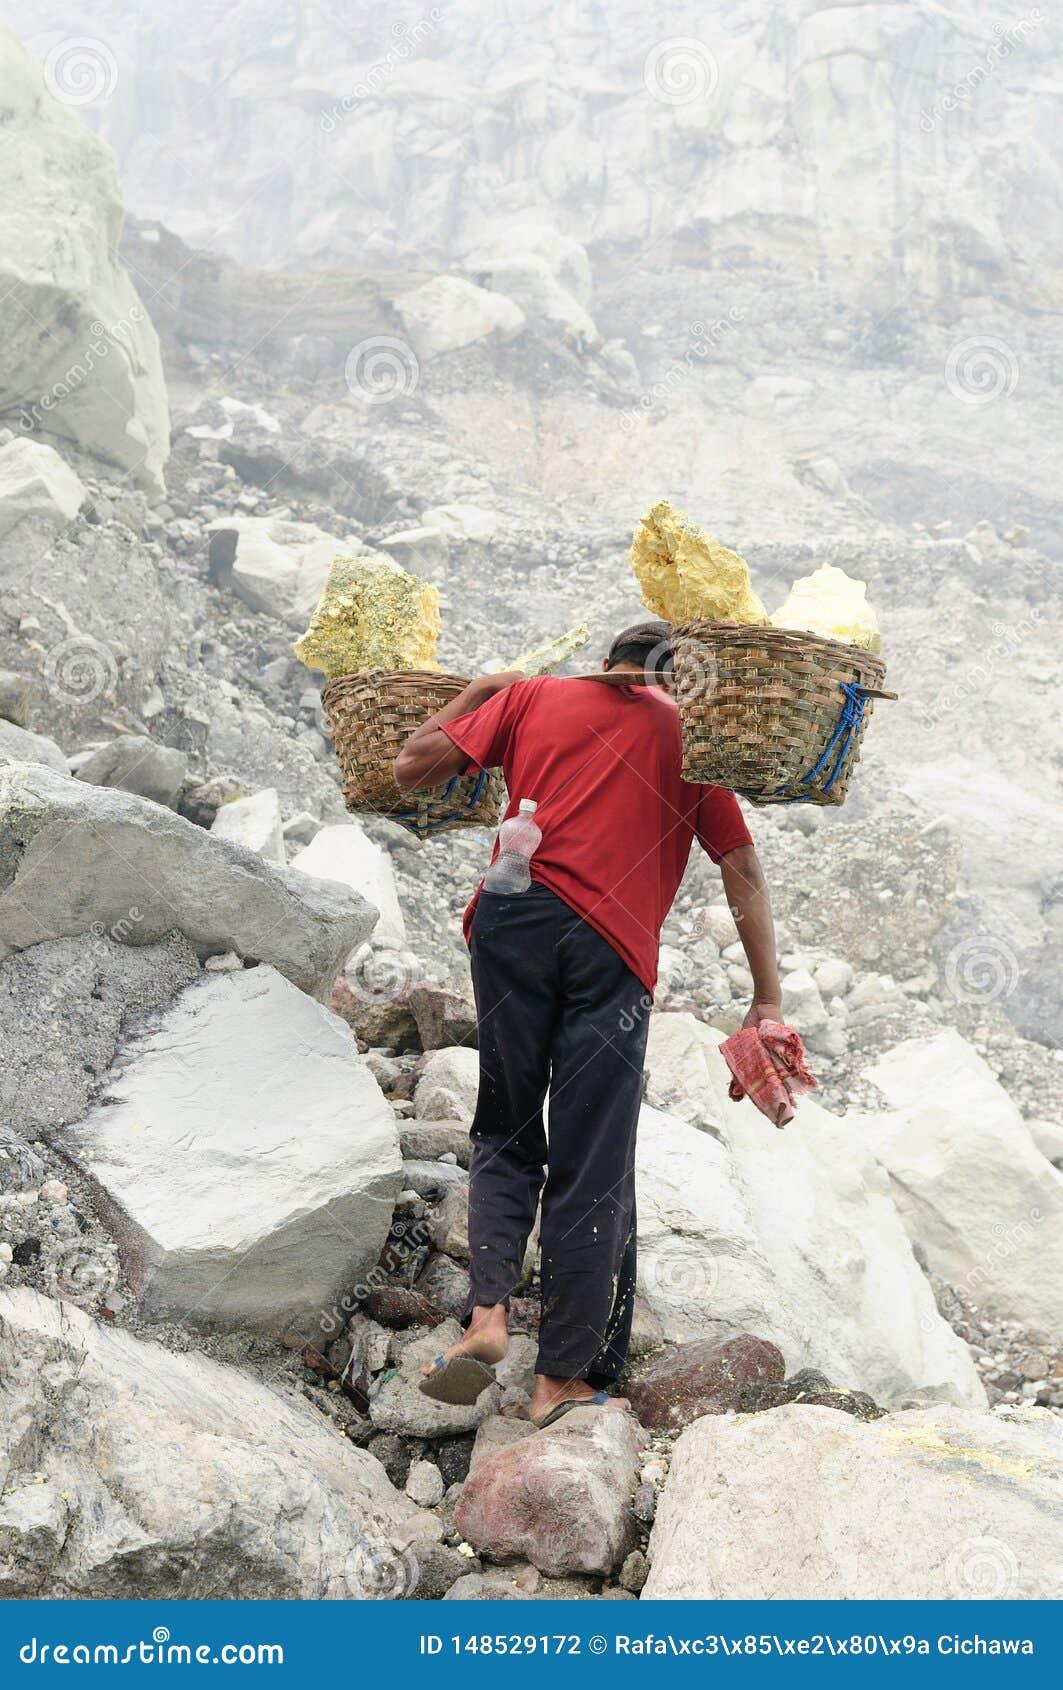 Innerhalb des Kraters des Vulkans in Indonesien